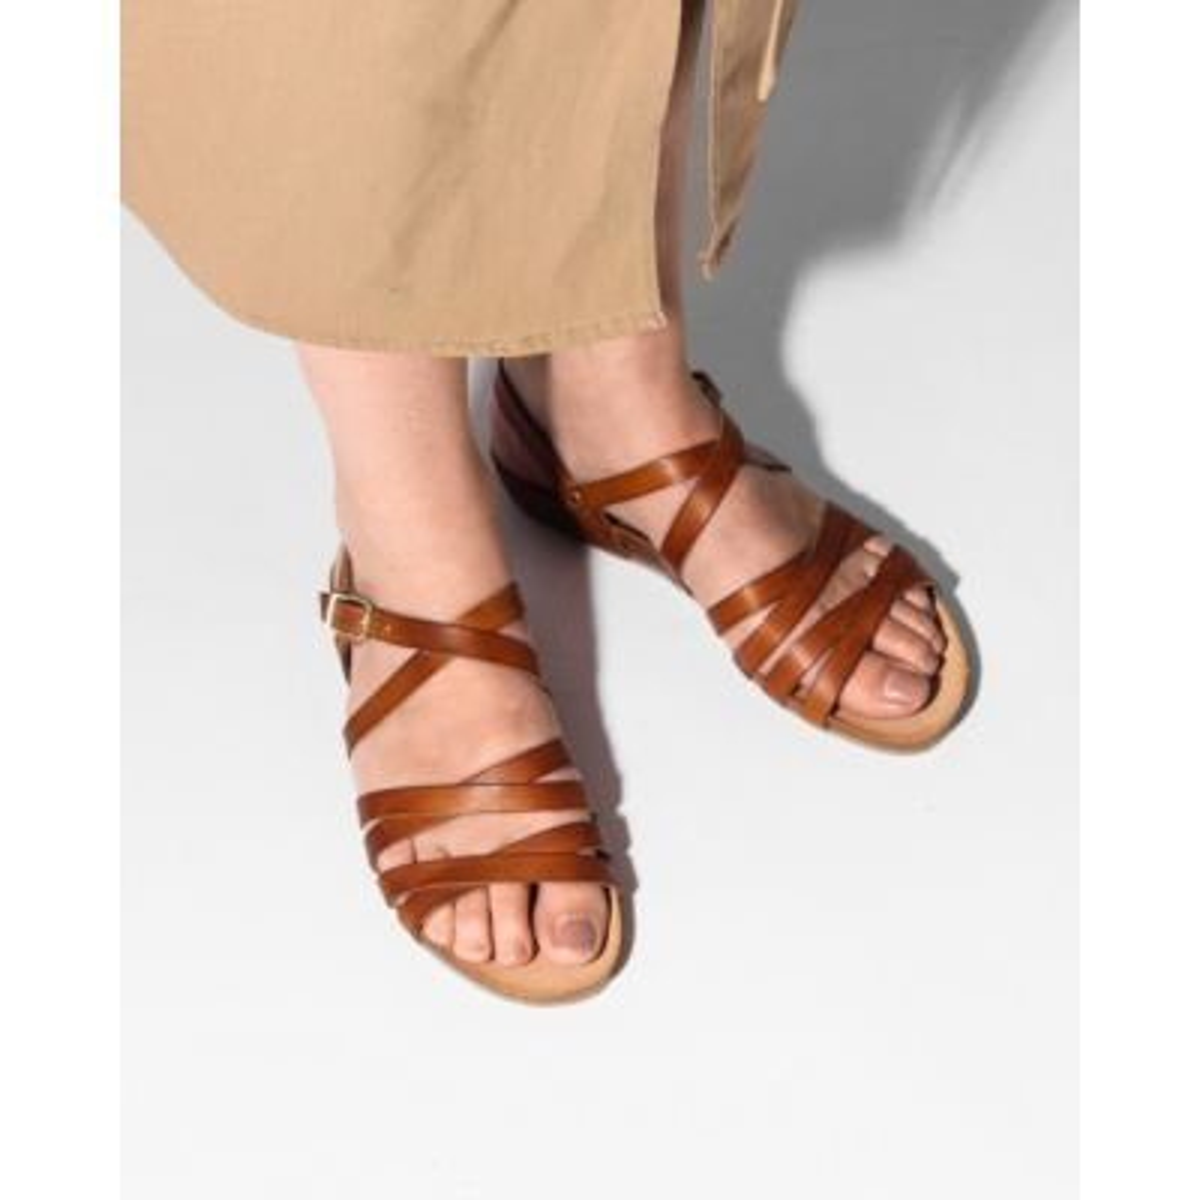 Sandaal-glad-leer-lichtbruin-